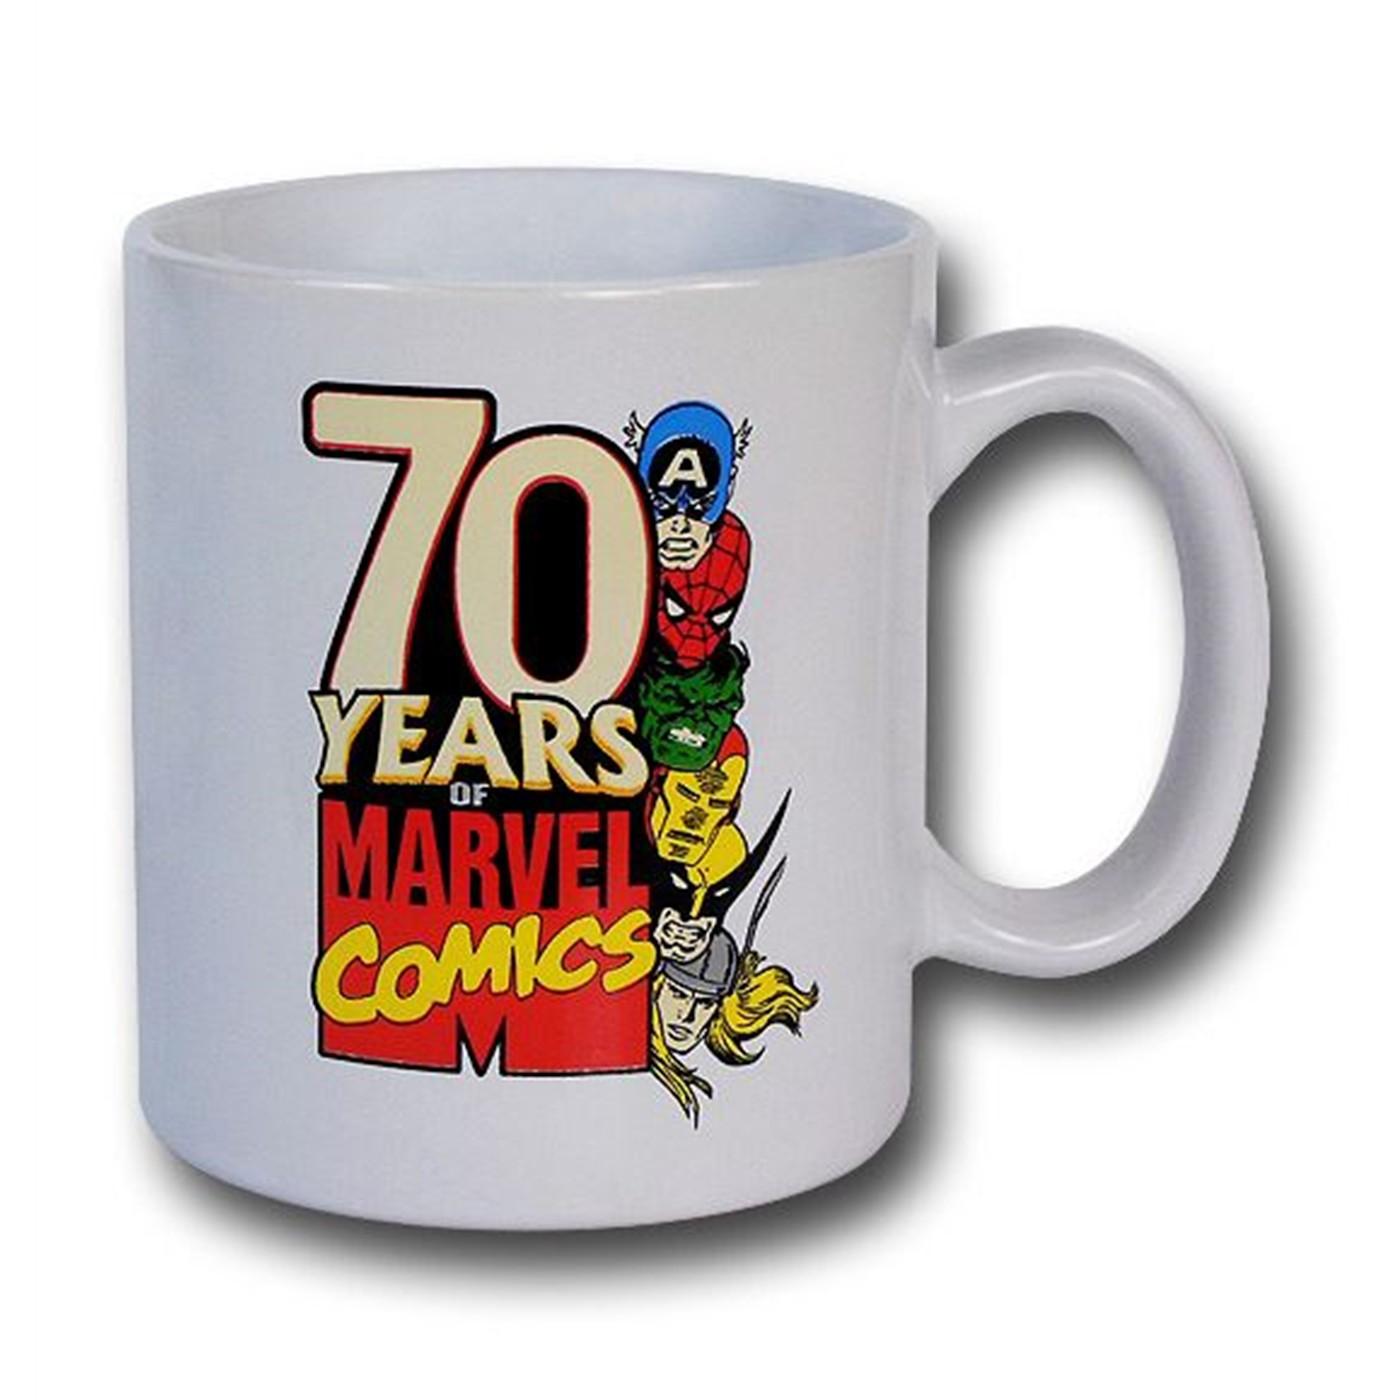 Marvel 70 Years Commemorative Mug